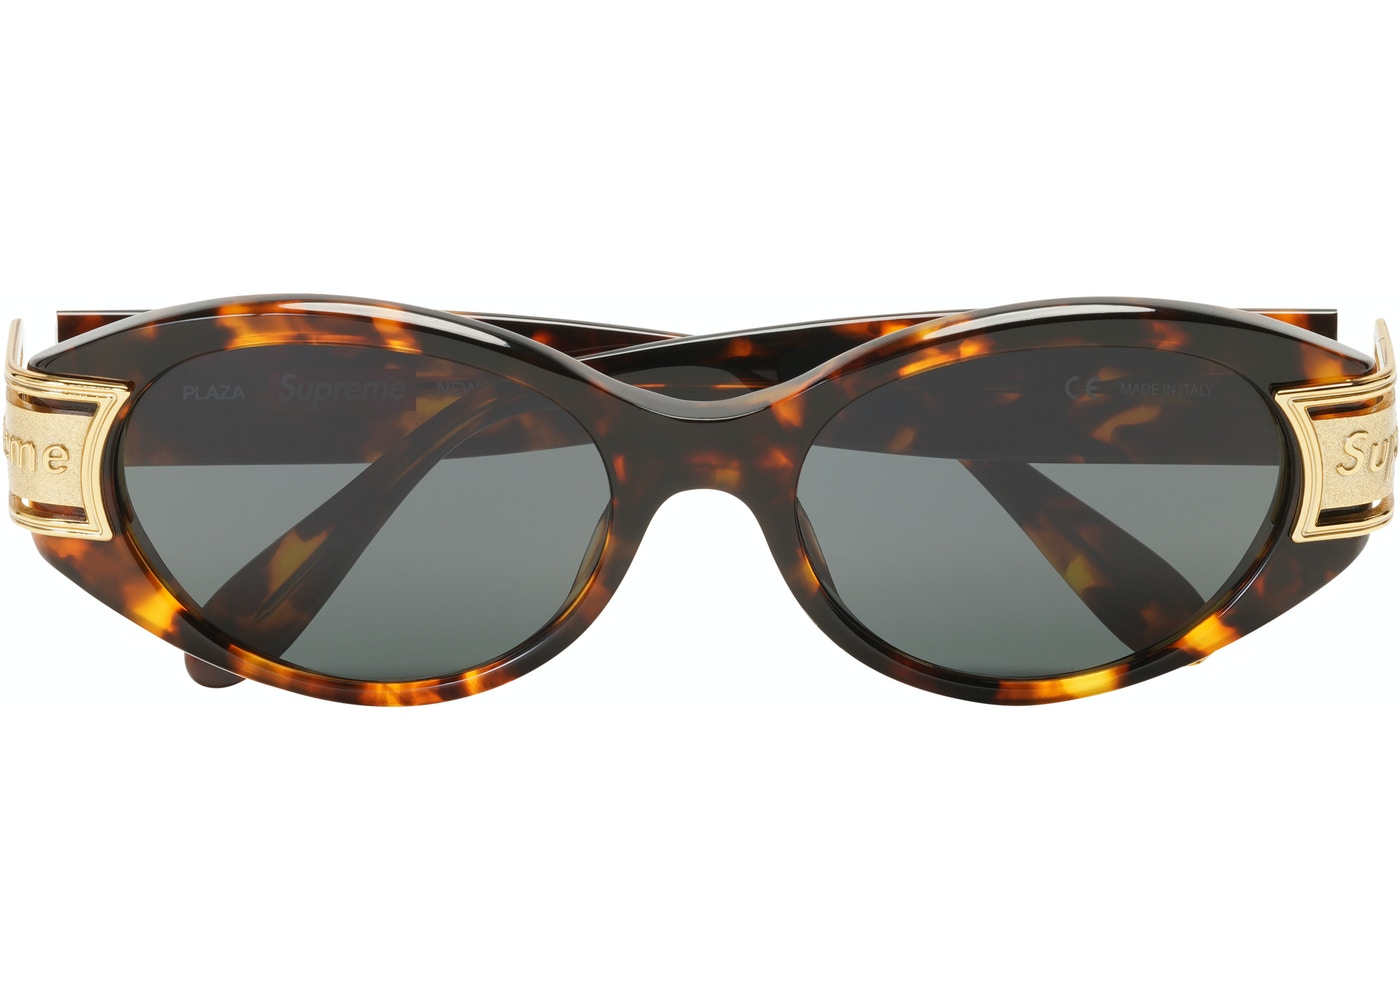 90a86102c048e Sell. or Ask. View All Bids. Supreme Plaza Sunglasses Tortoise